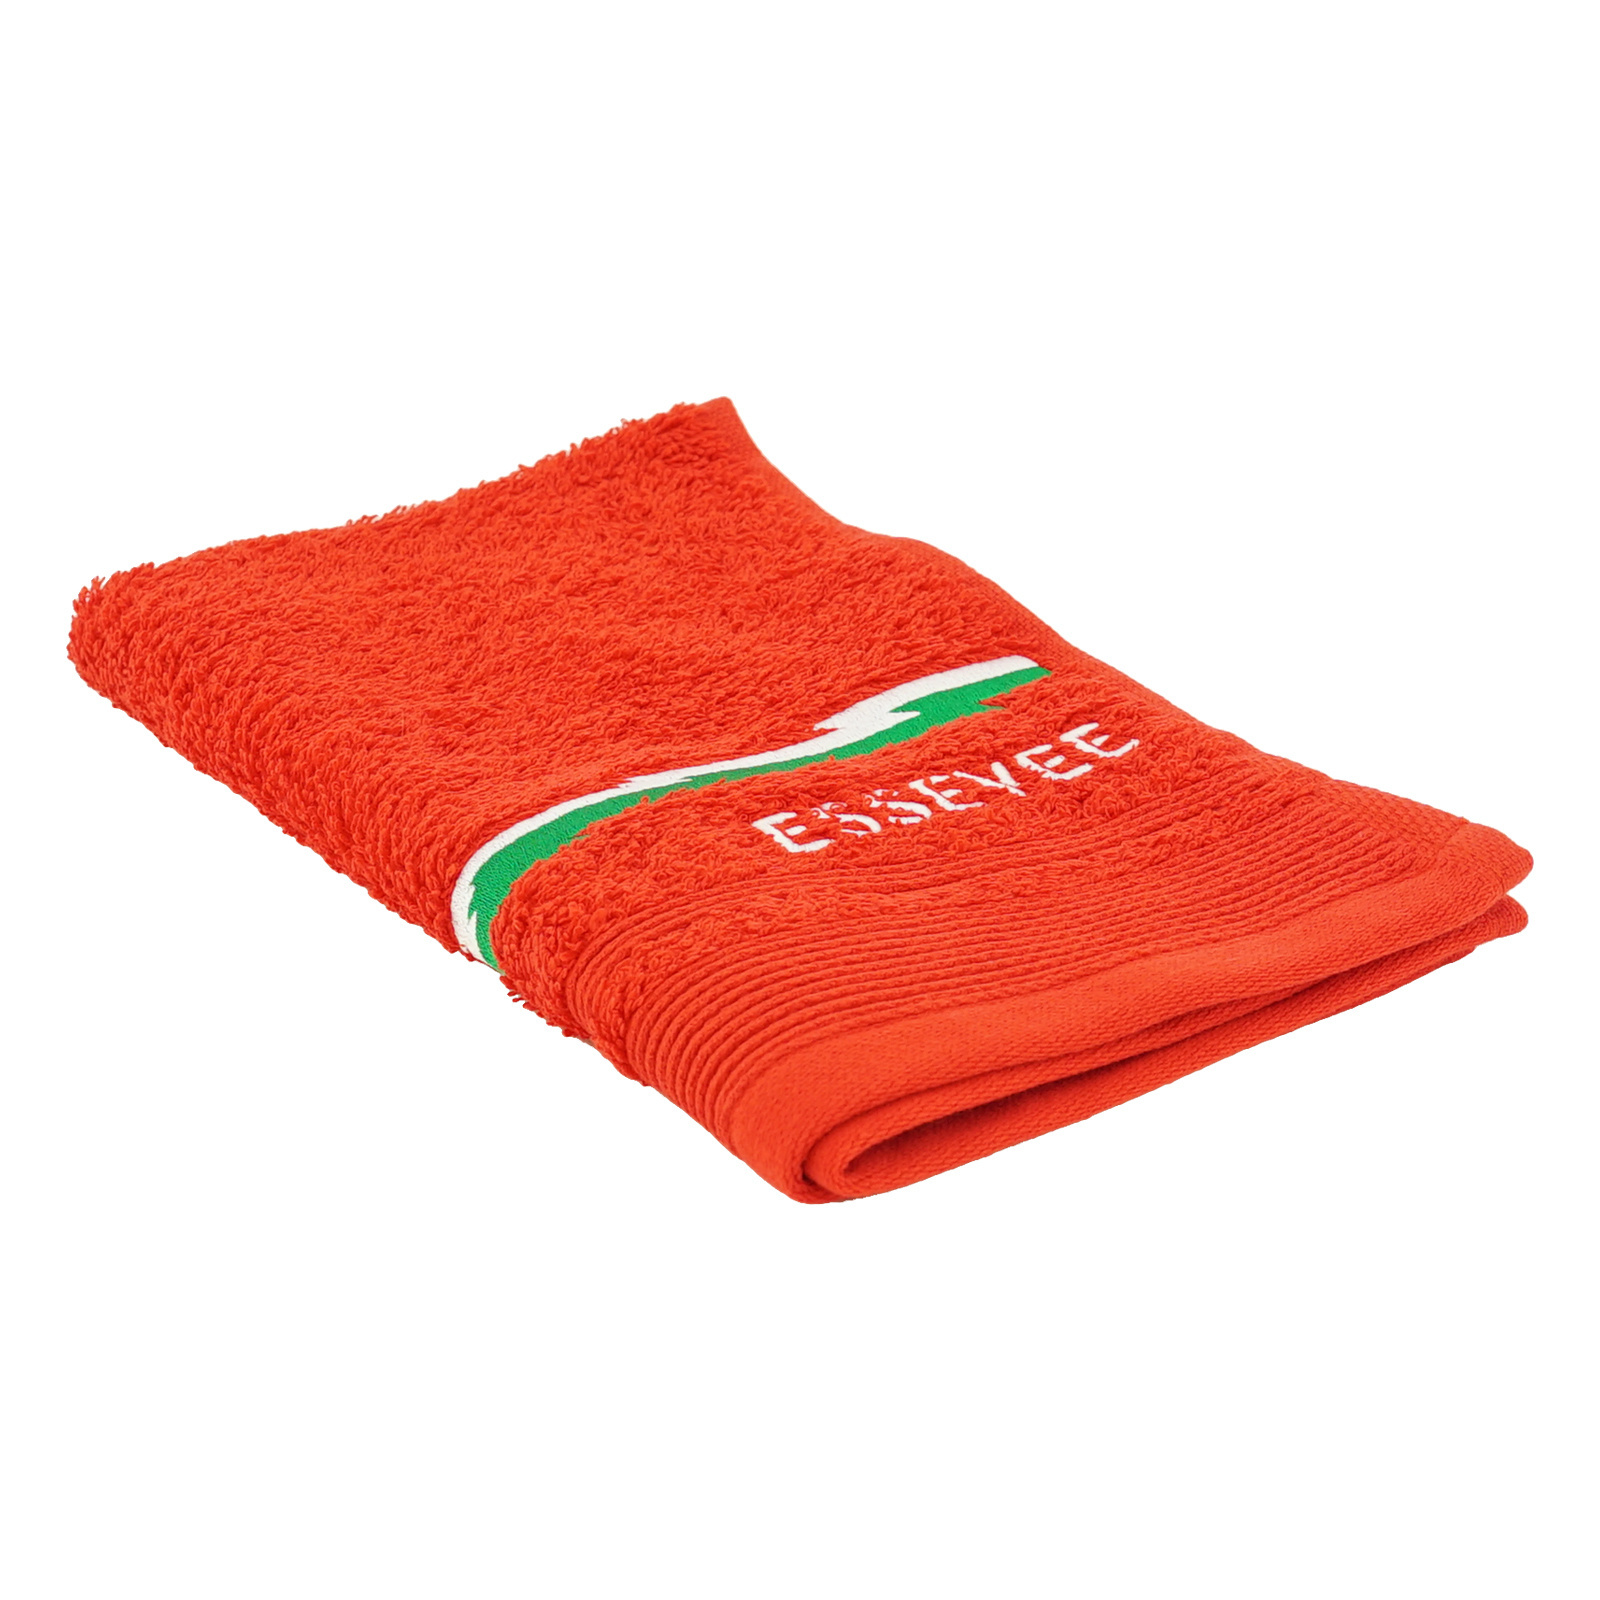 Topfanz Handdoek bliksem groet wit